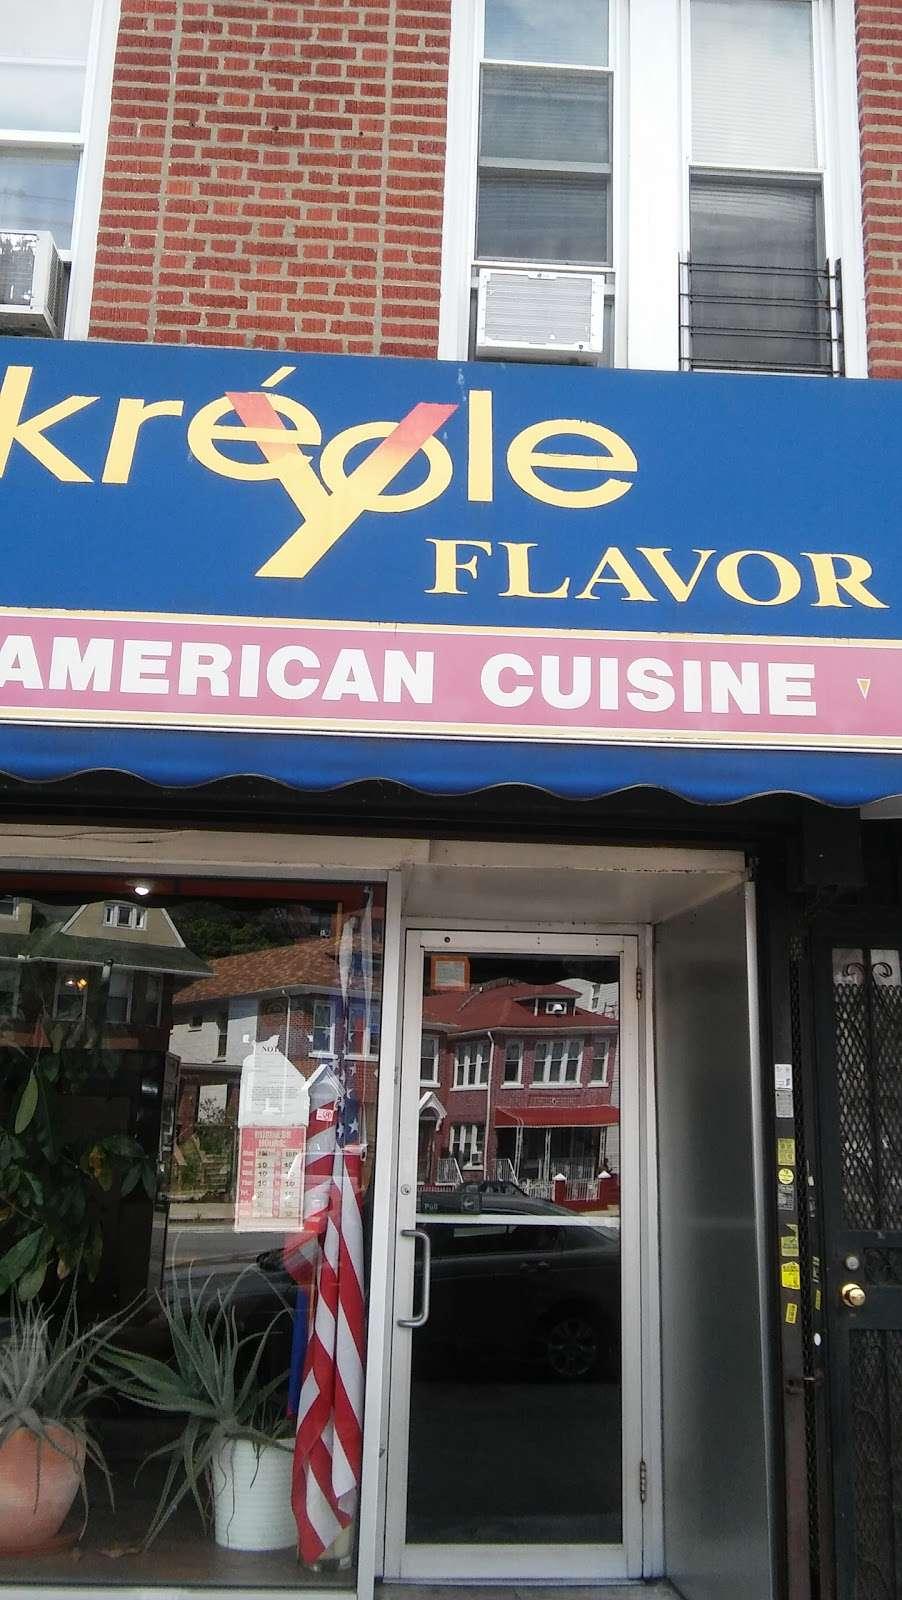 Kreyol Flavor - restaurant  | Photo 3 of 10 | Address: 1738 Flatbush Ave, Brooklyn, NY 11210, USA | Phone: (718) 258-0509